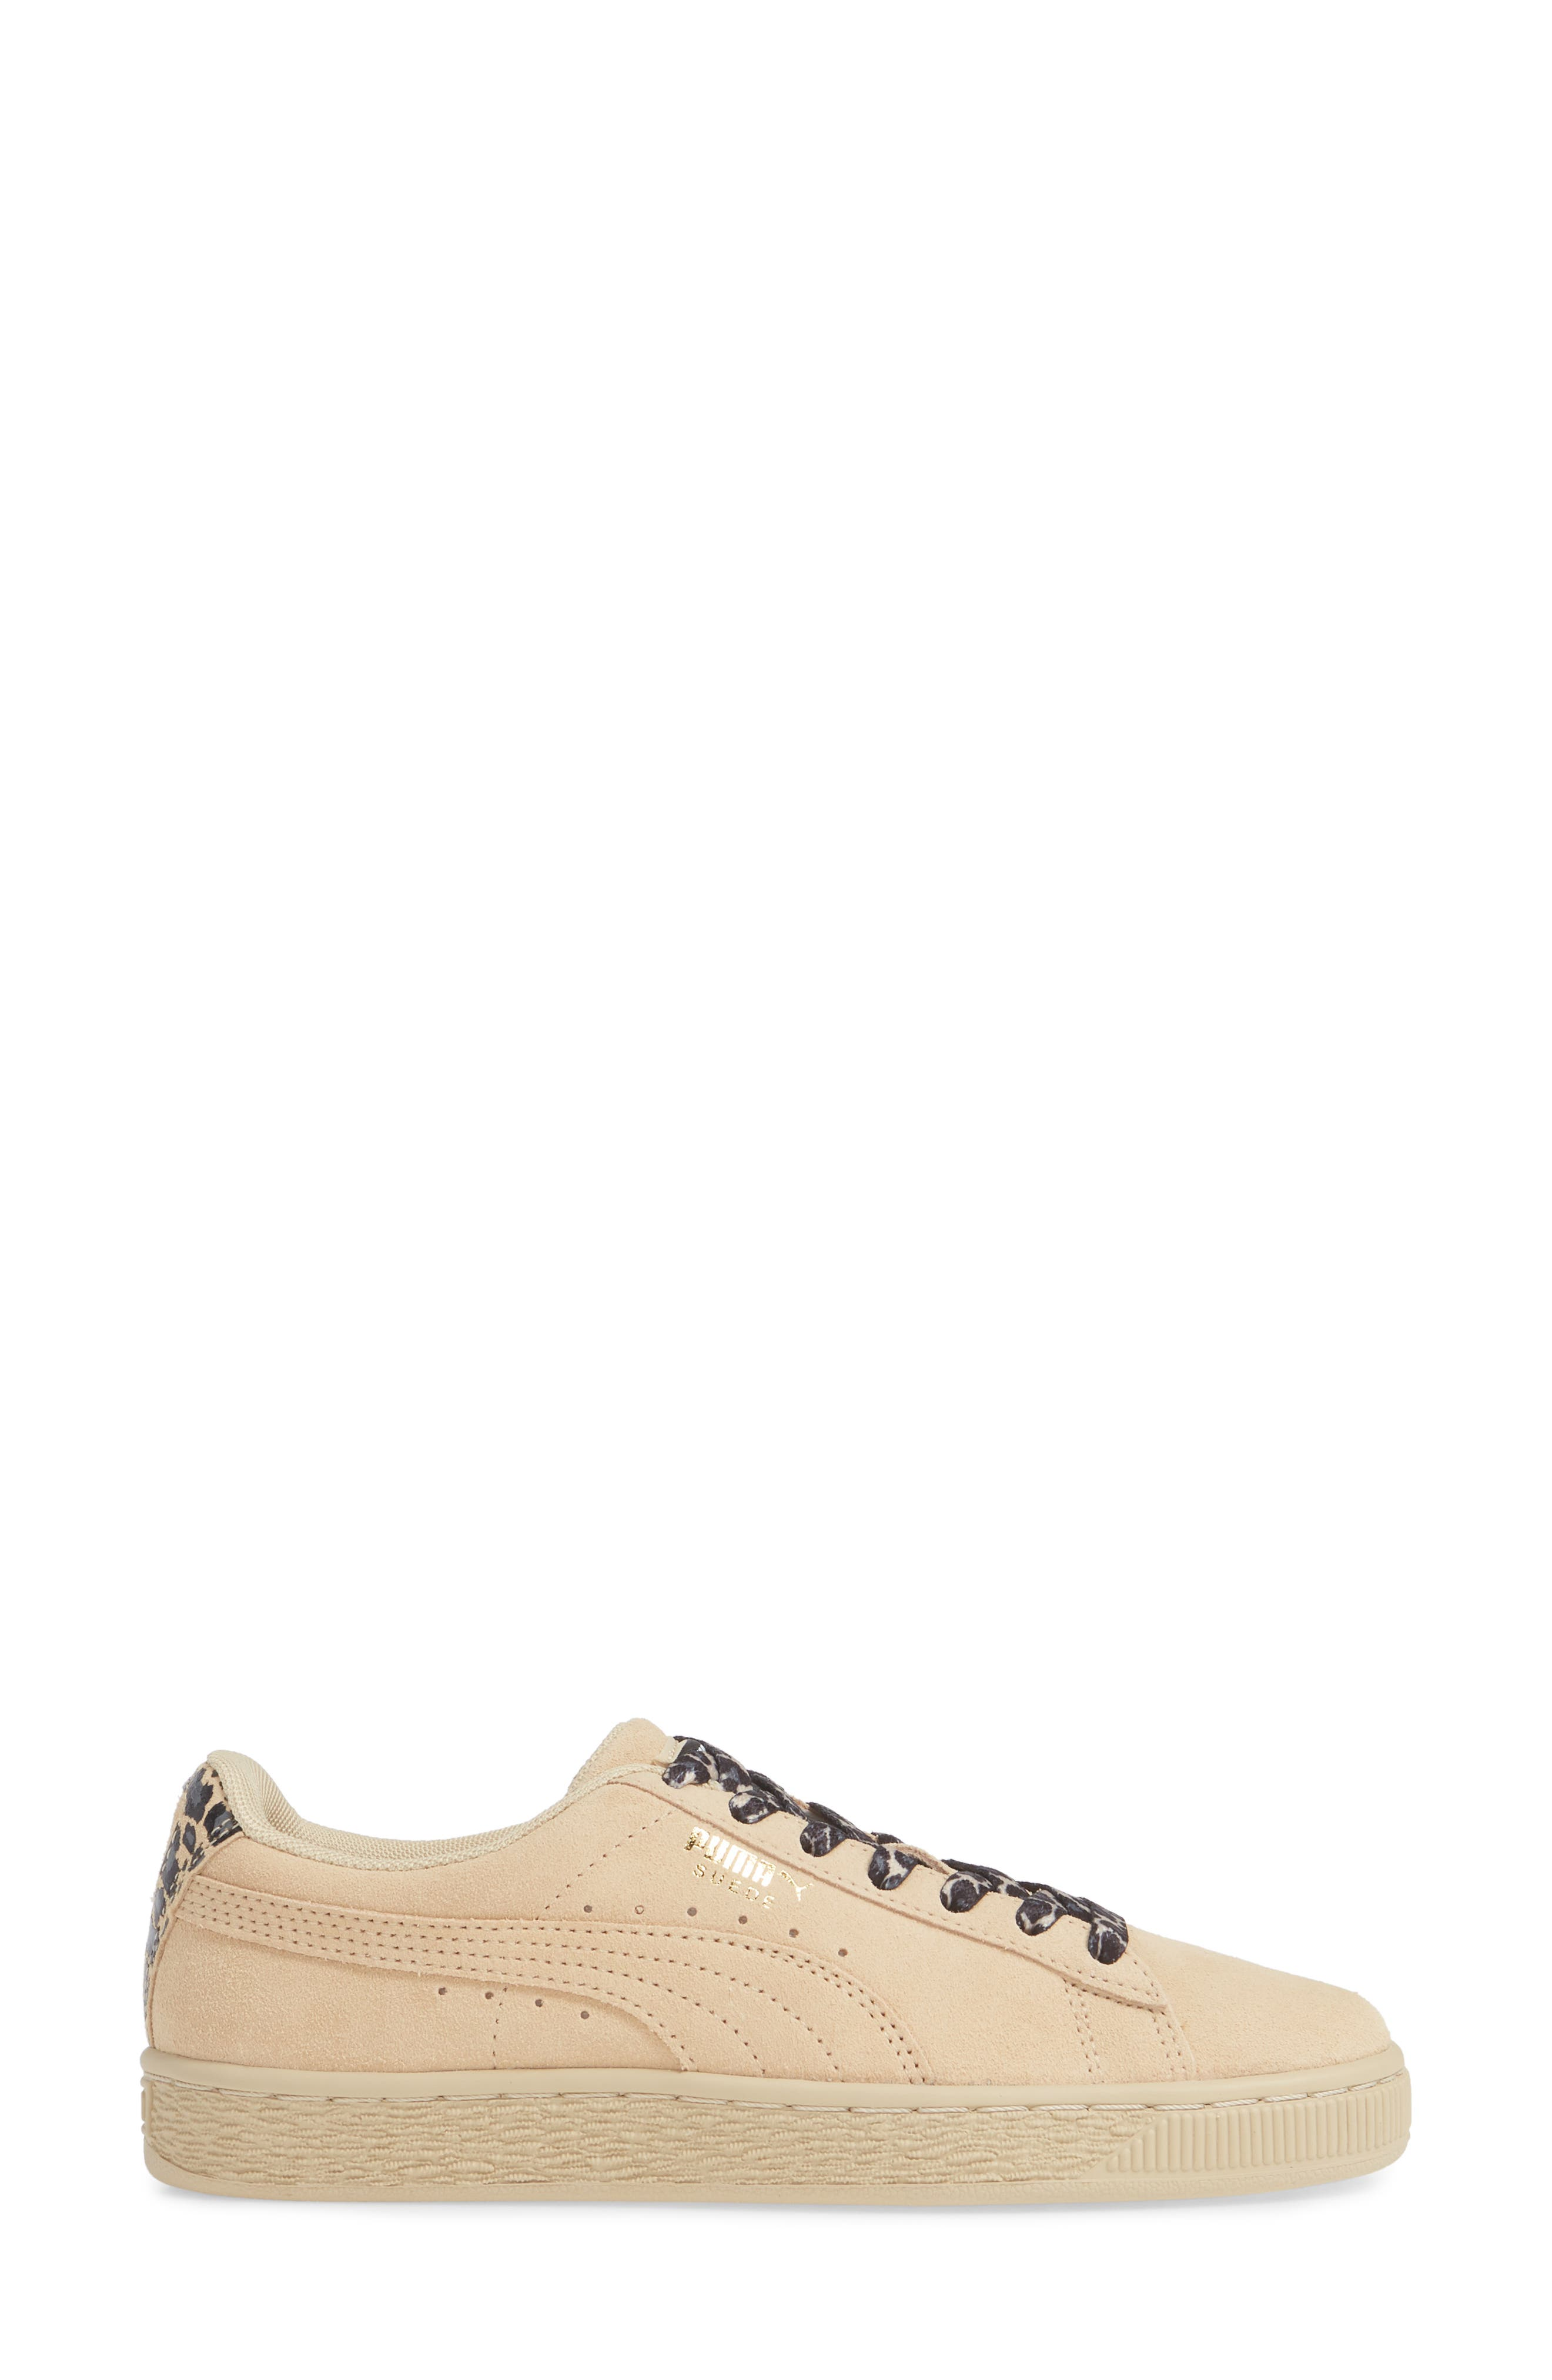 Suede Wild Sneaker,                             Alternate thumbnail 3, color,                             BLACK/ TEAM GOLD/ PEBBLE